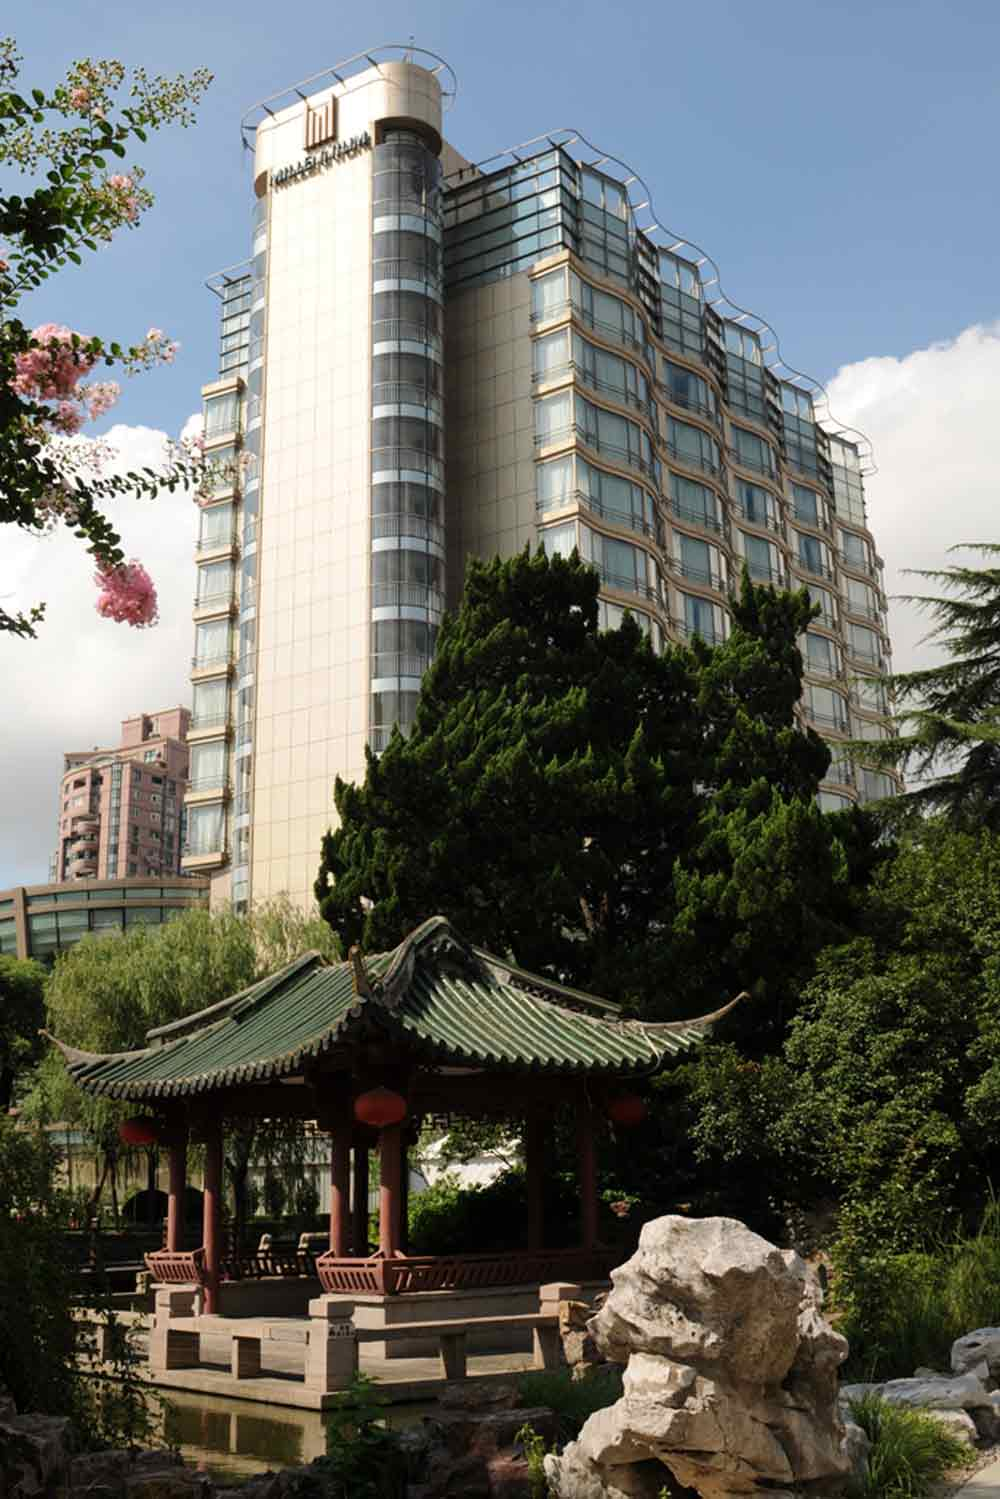 Exterior Pavilion of The Millennium Hongqia Shanghai Hotel